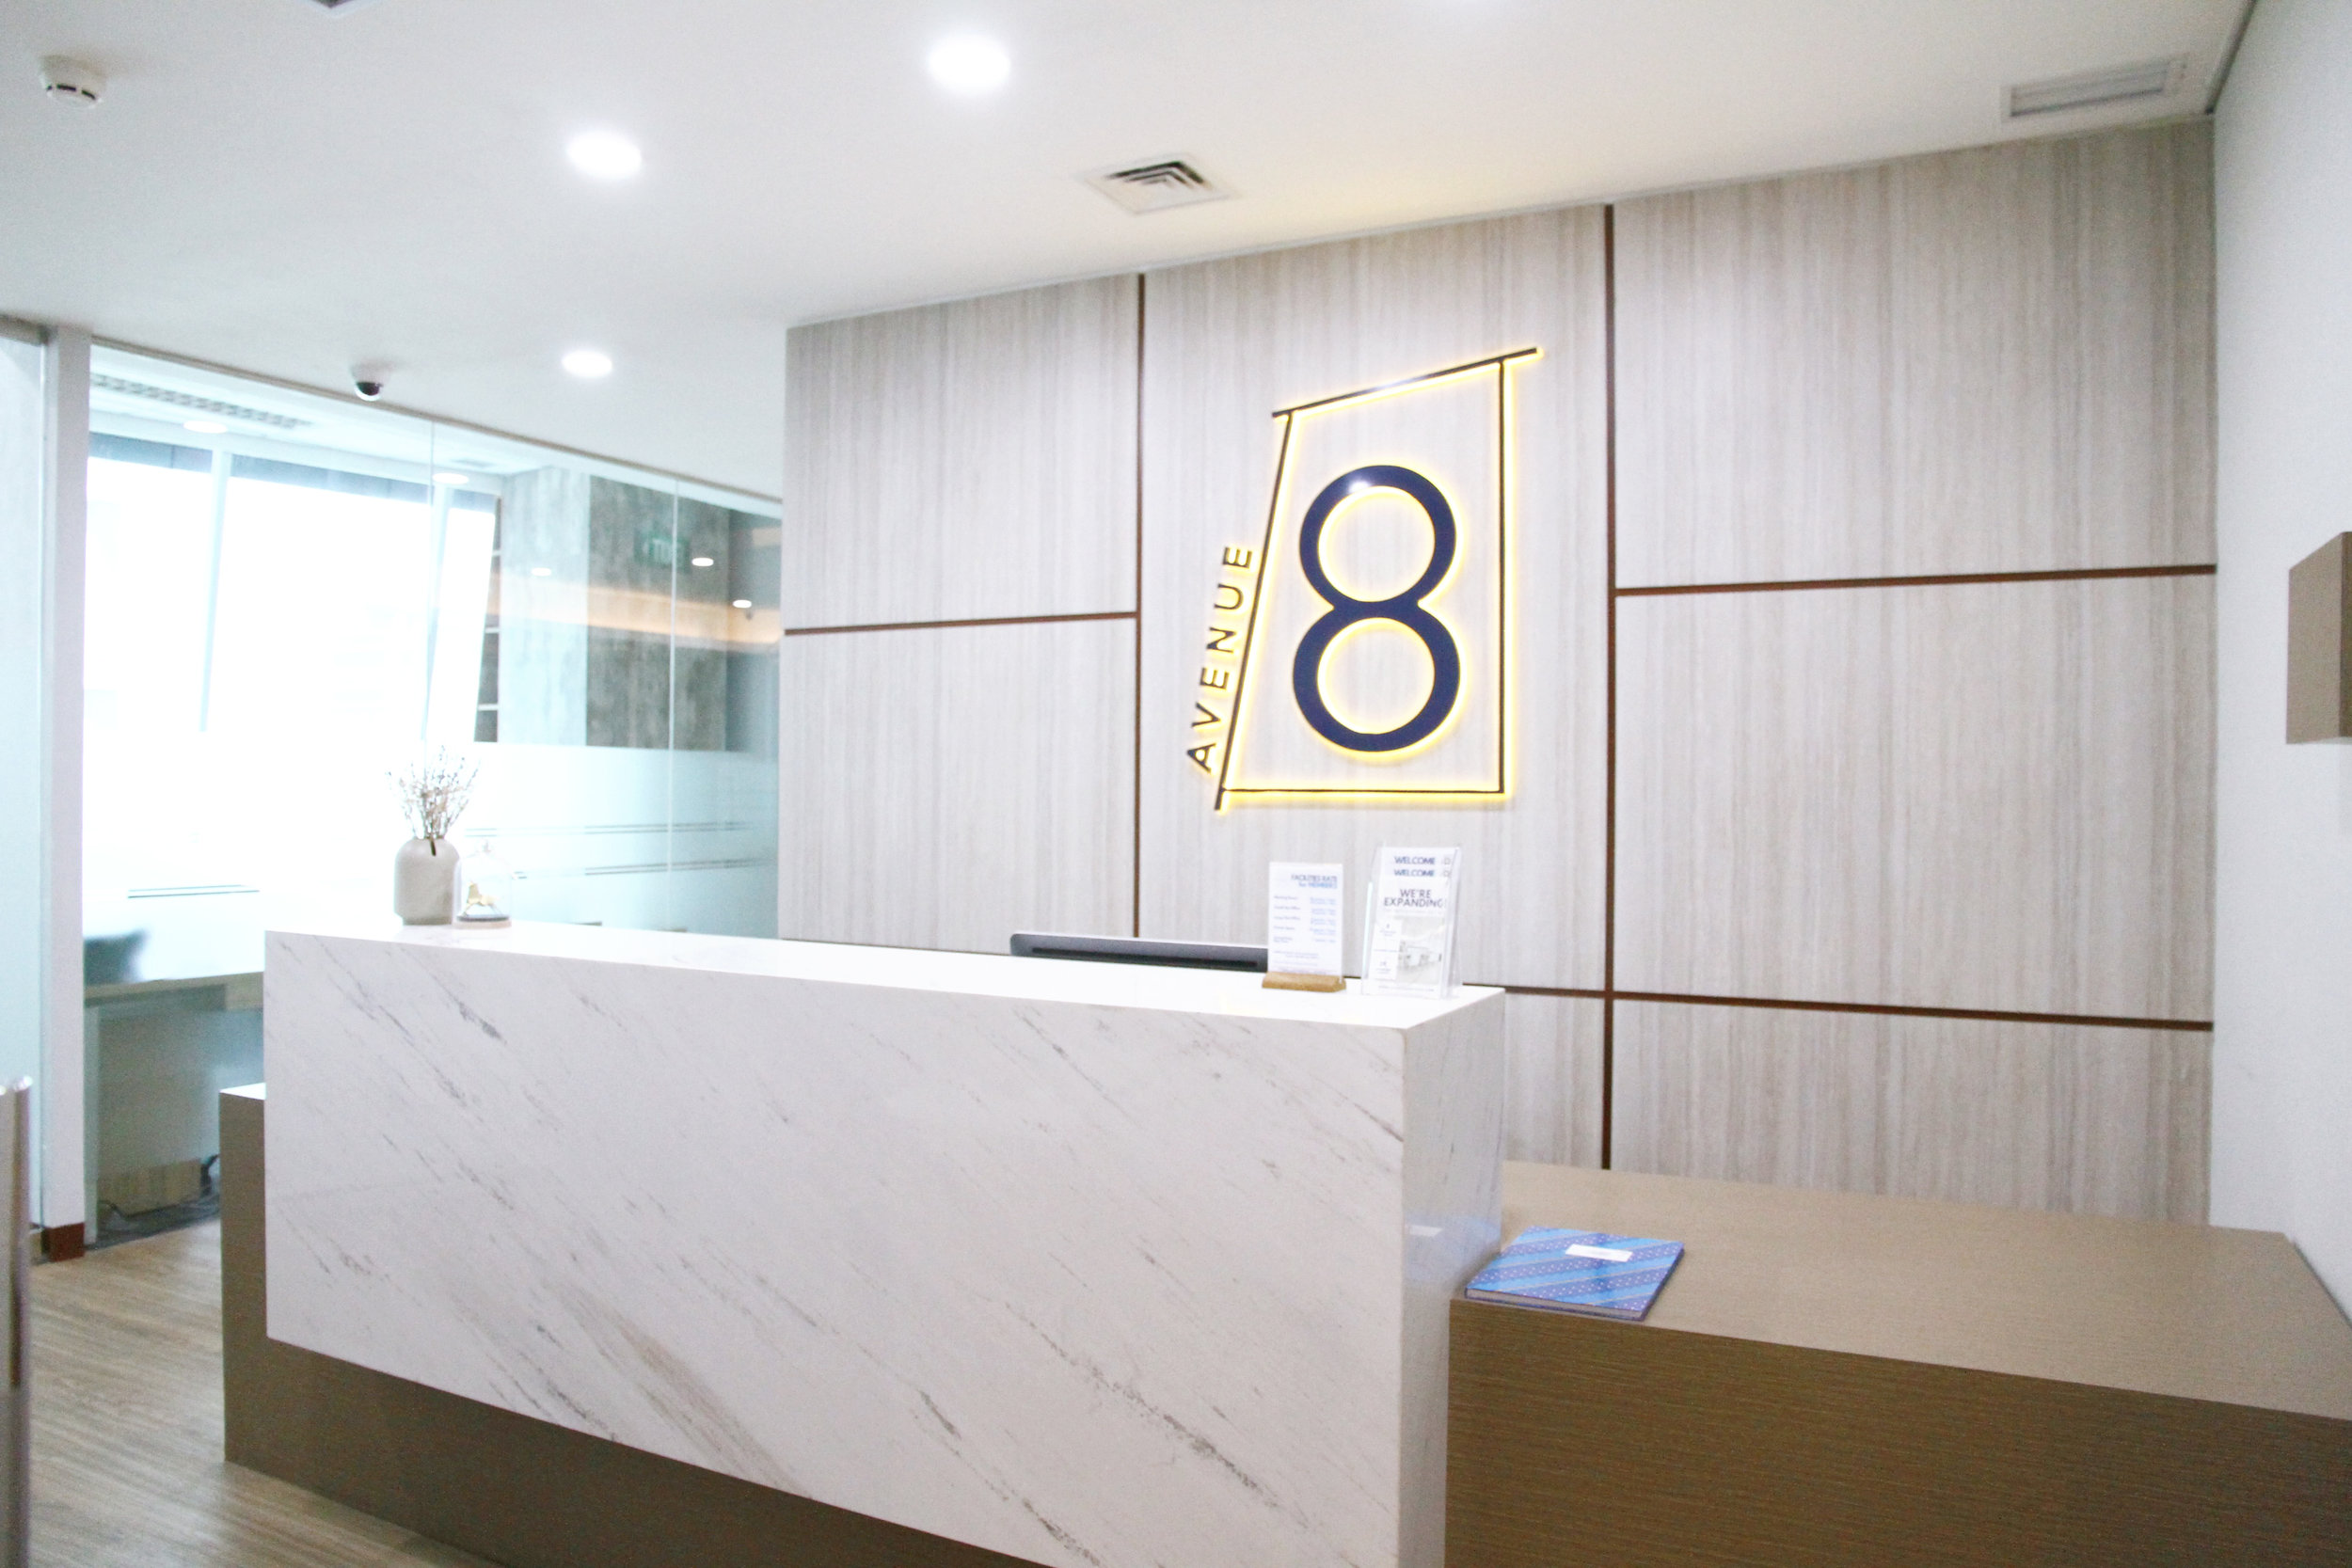 avenue8 reception